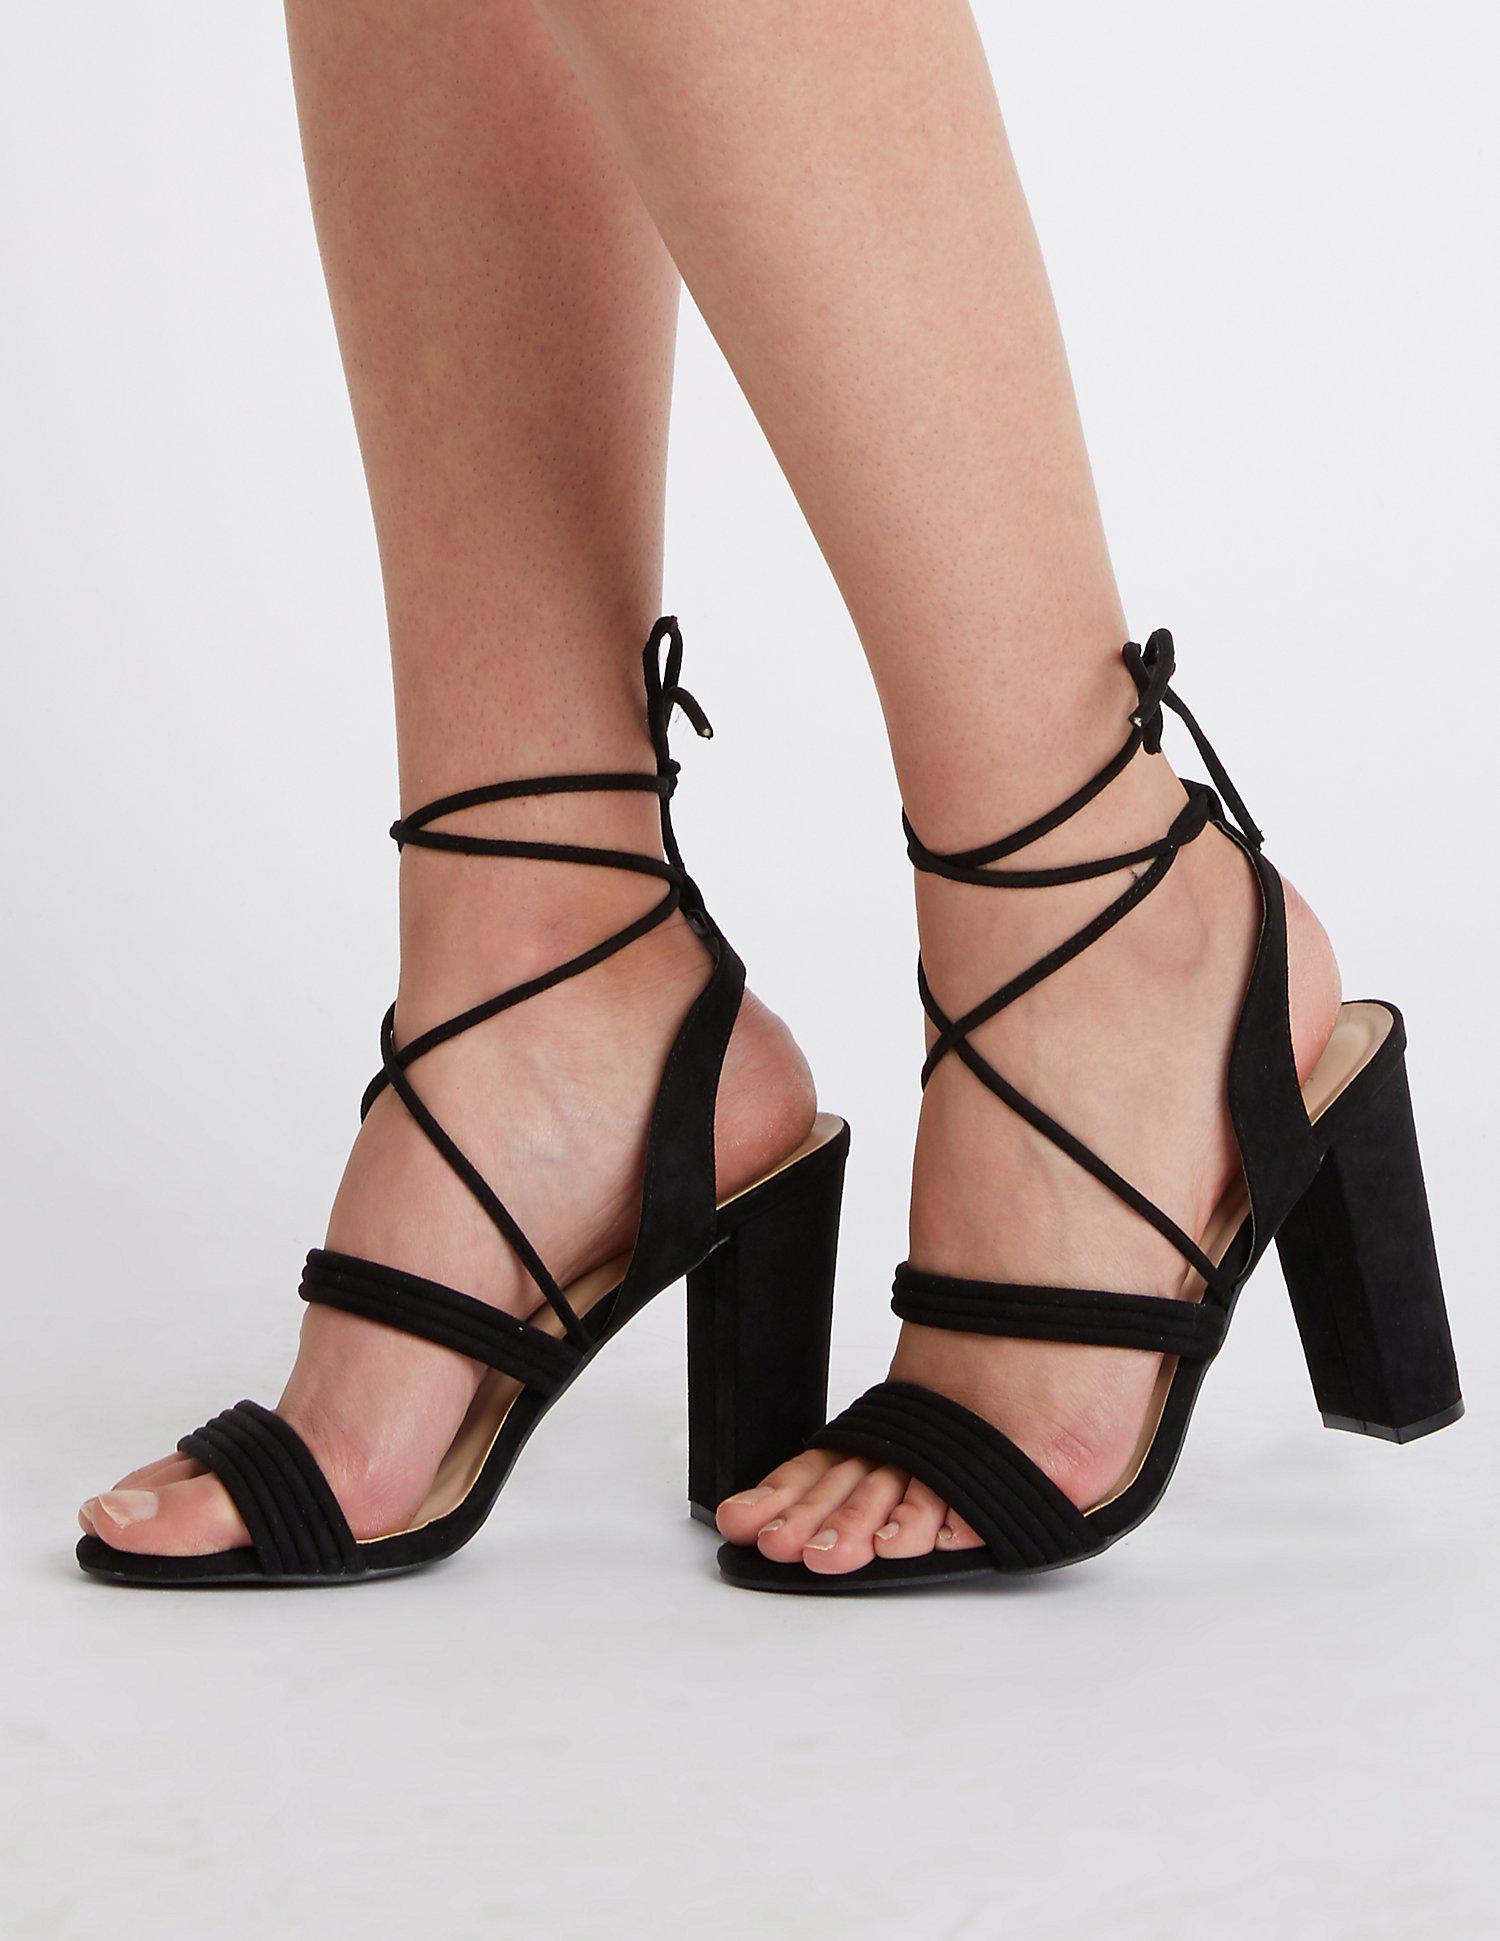 f3bda25681c6 Lyst - Charlotte Russe Ankle Wrap Block Heel Sandals in Black